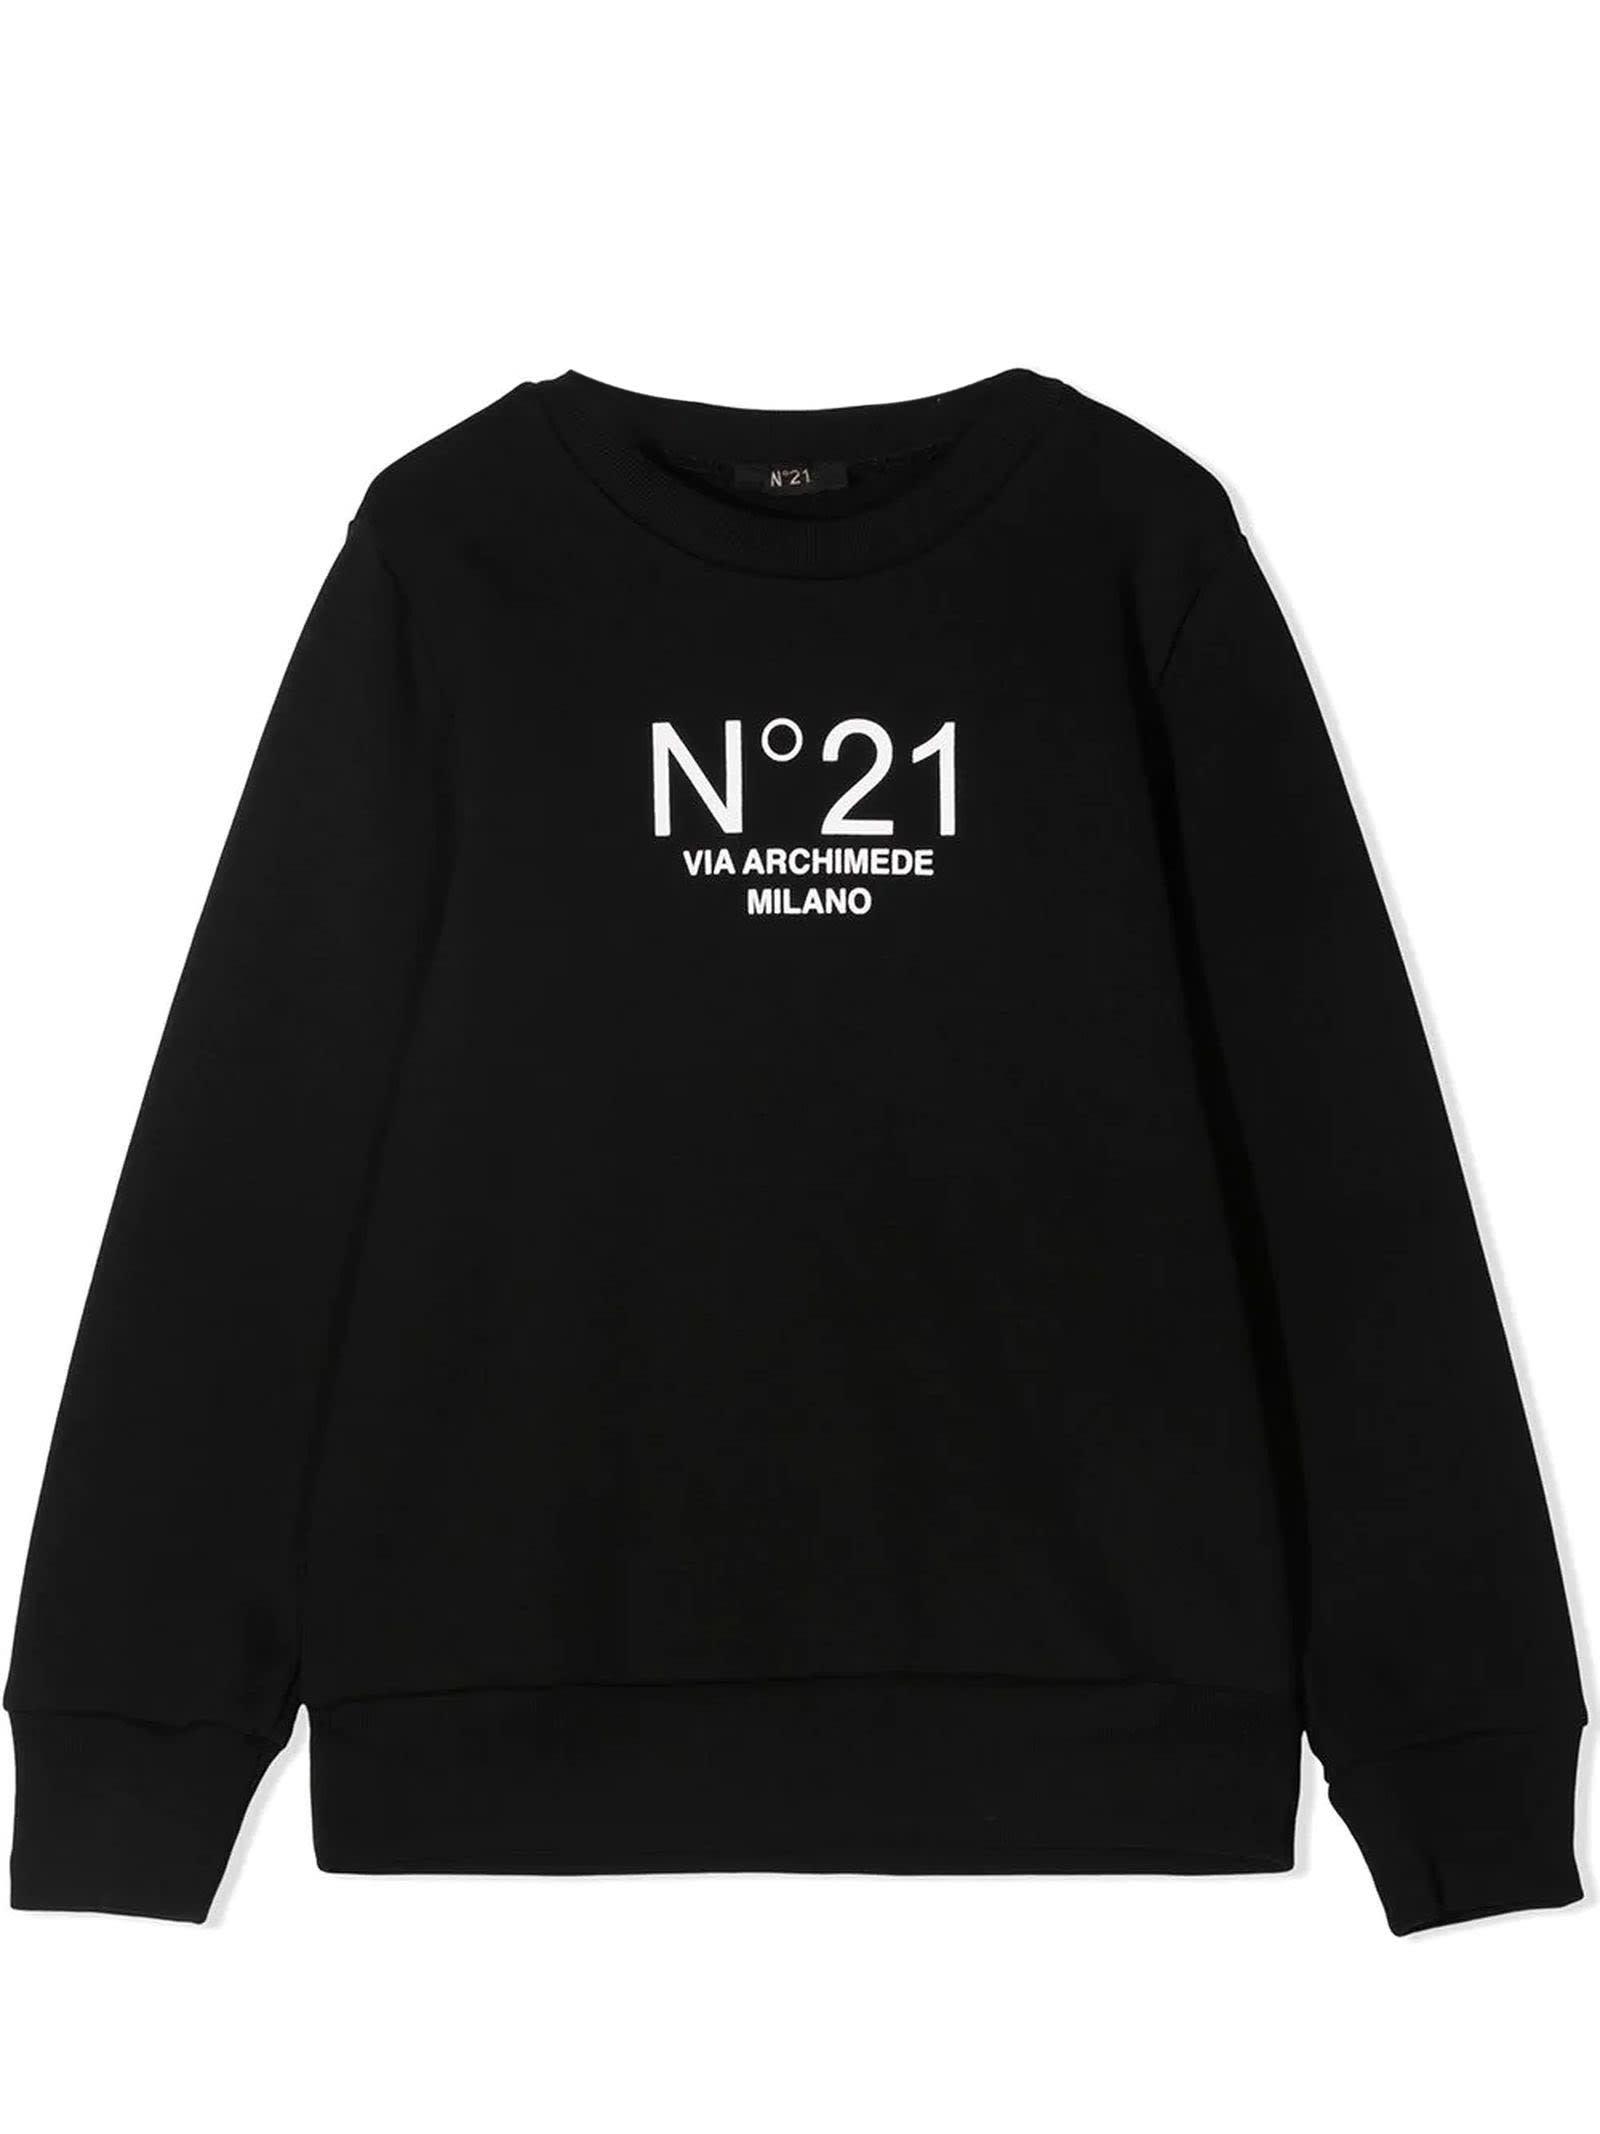 N.21 Black Cotton Sweatshirt